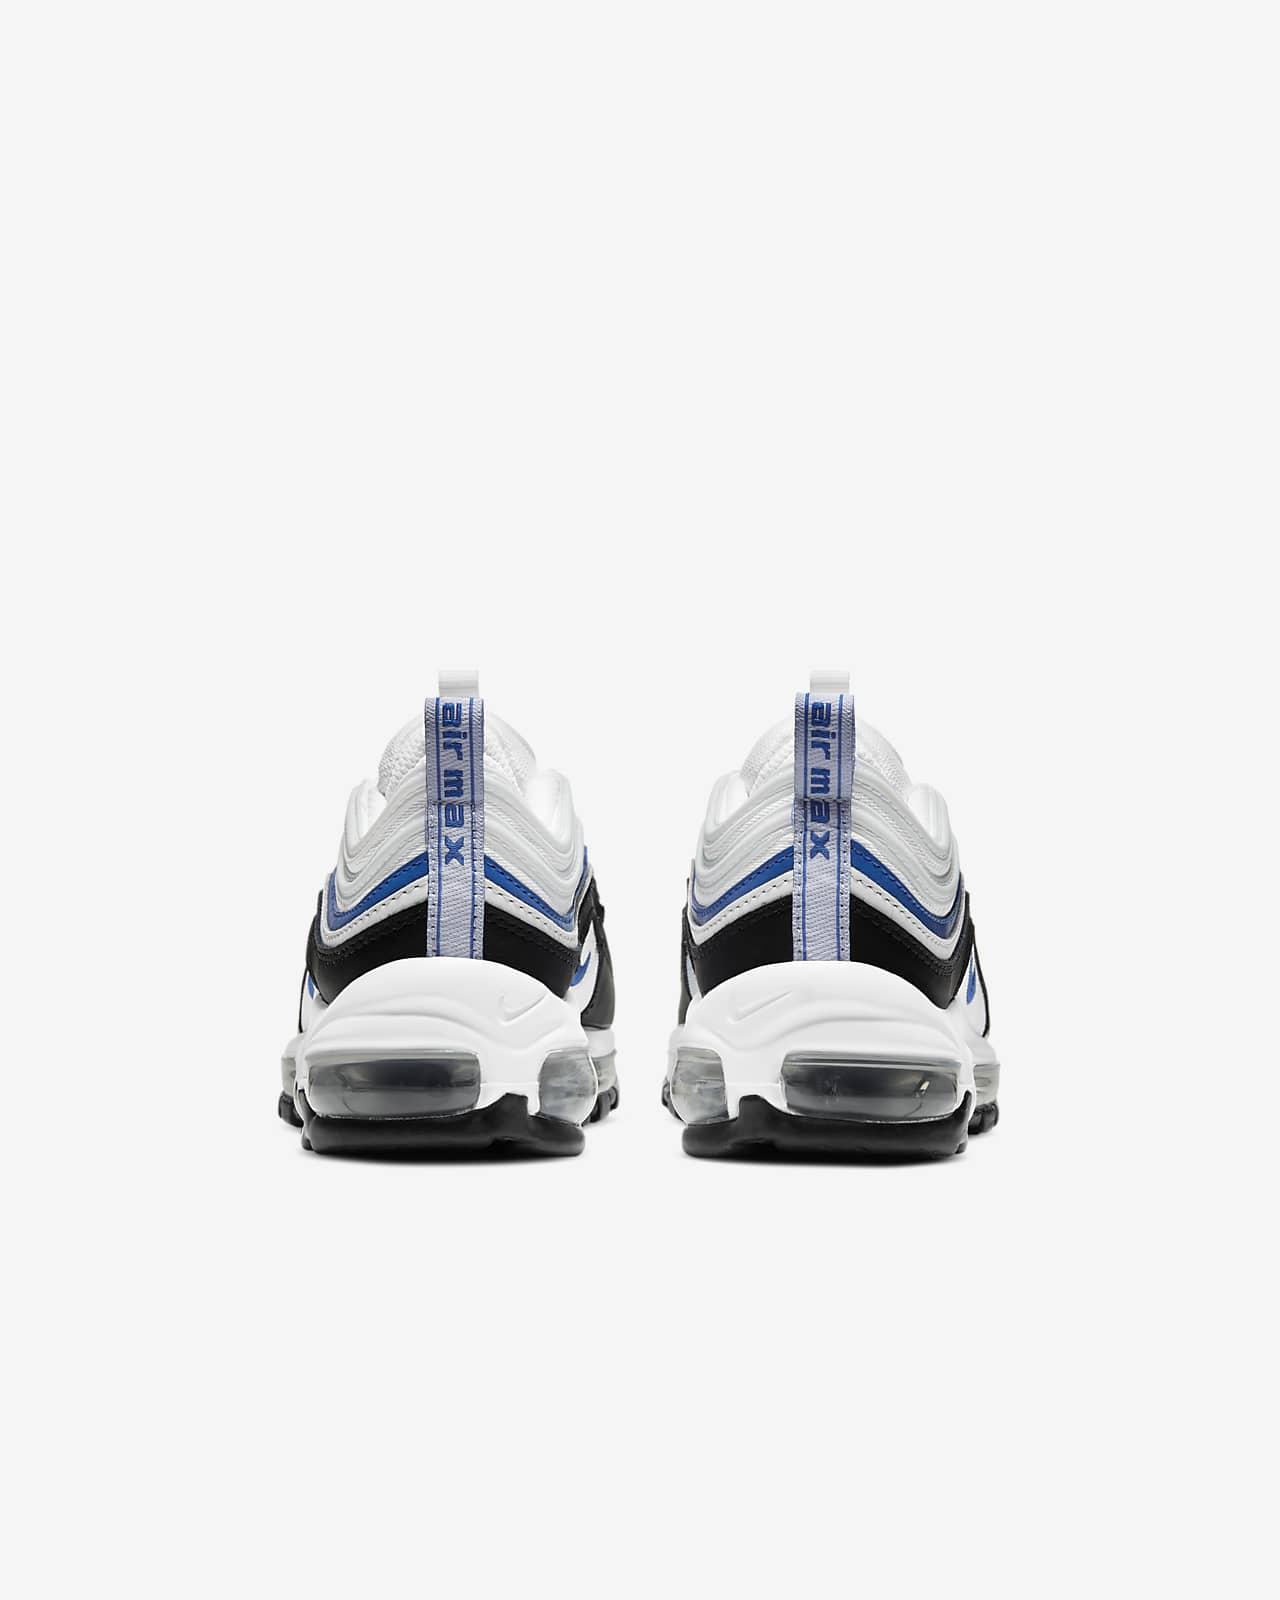 Nike Air Max 97 Older Kids' Shoes. Nike LU